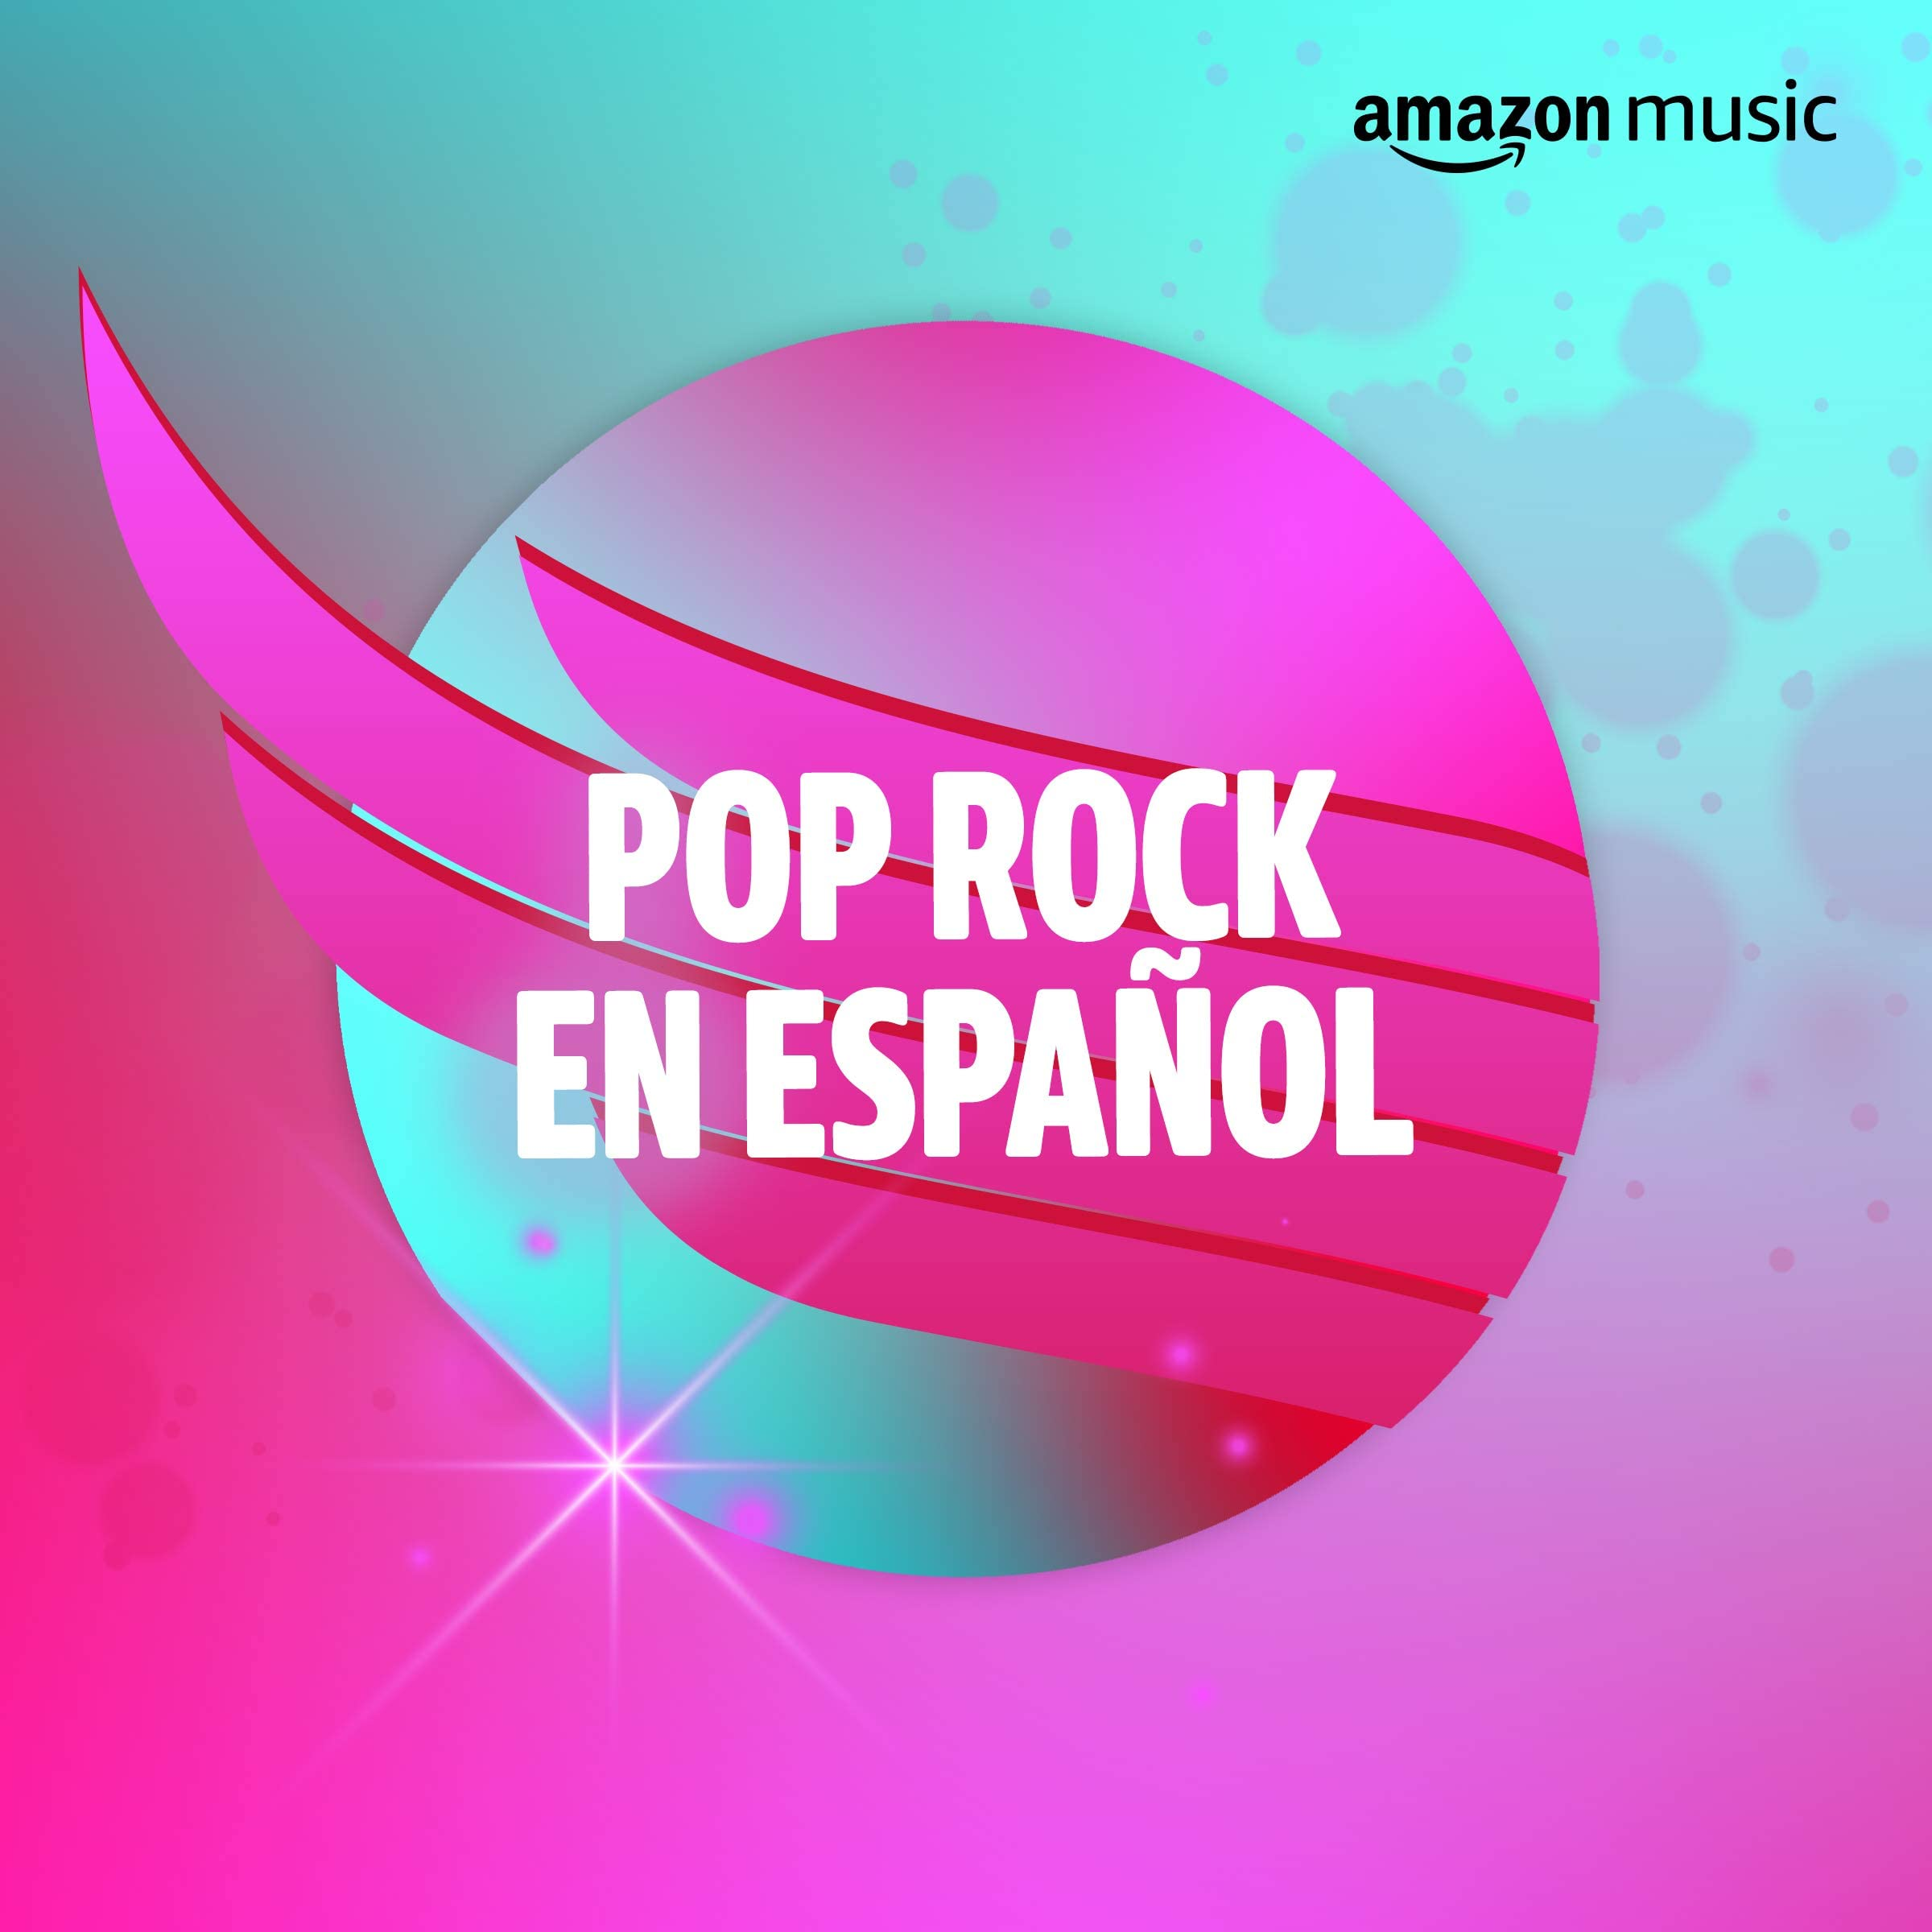 Pop-Rock en español